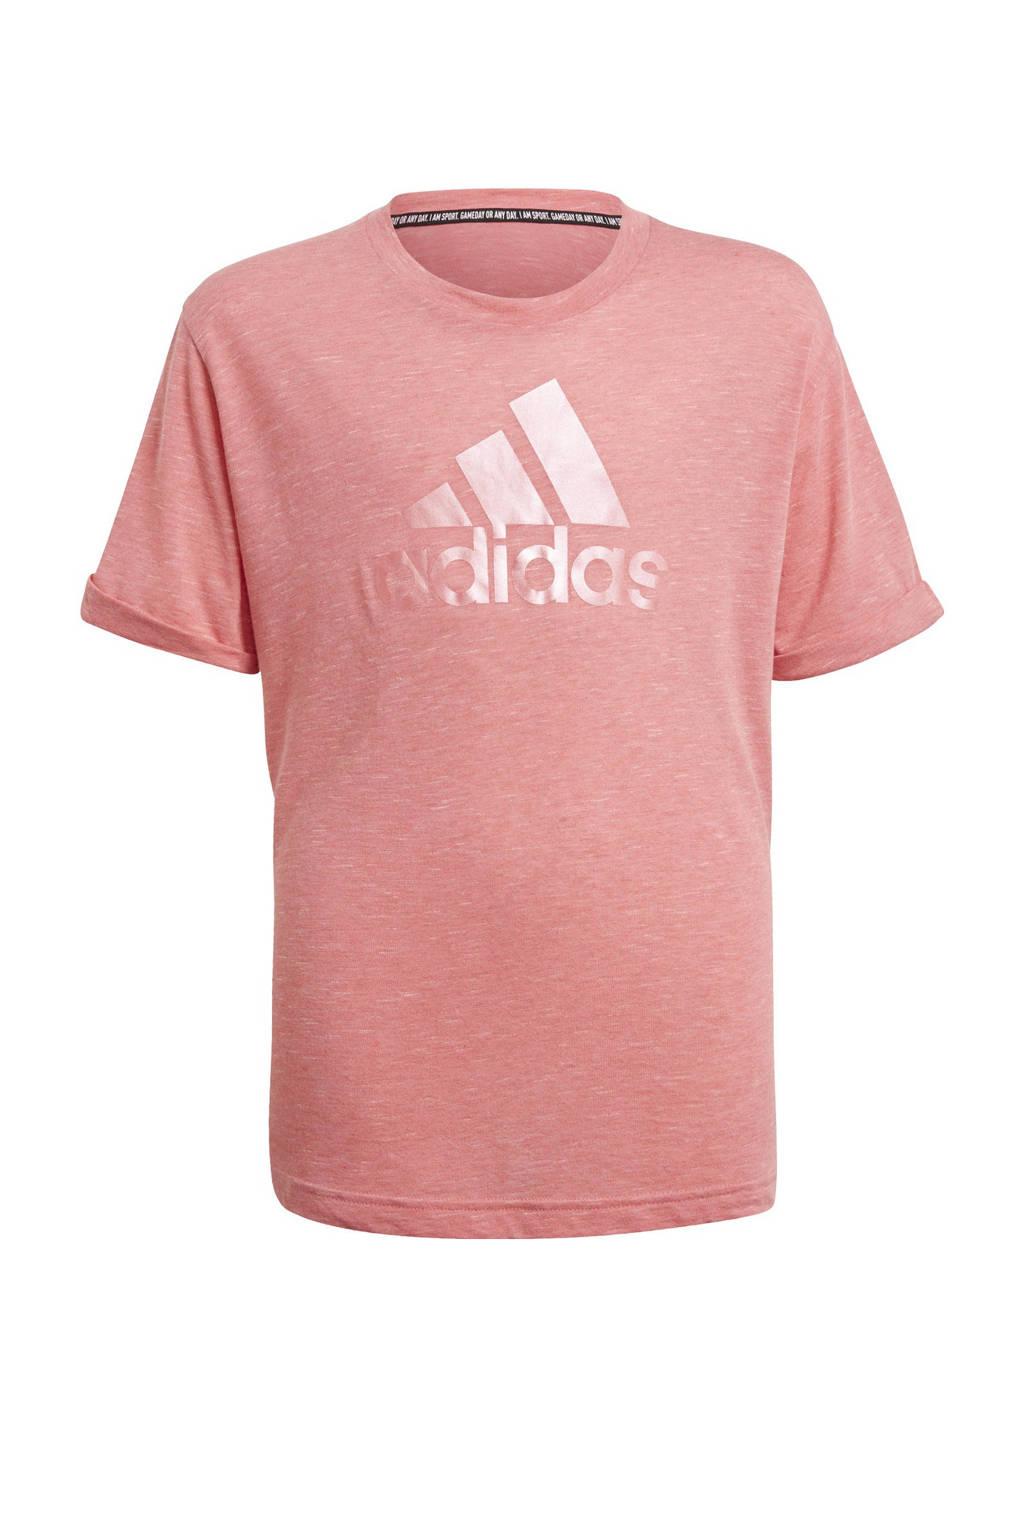 adidas Performance Future Icons sport T-shirt lichtroze, Lichtroze